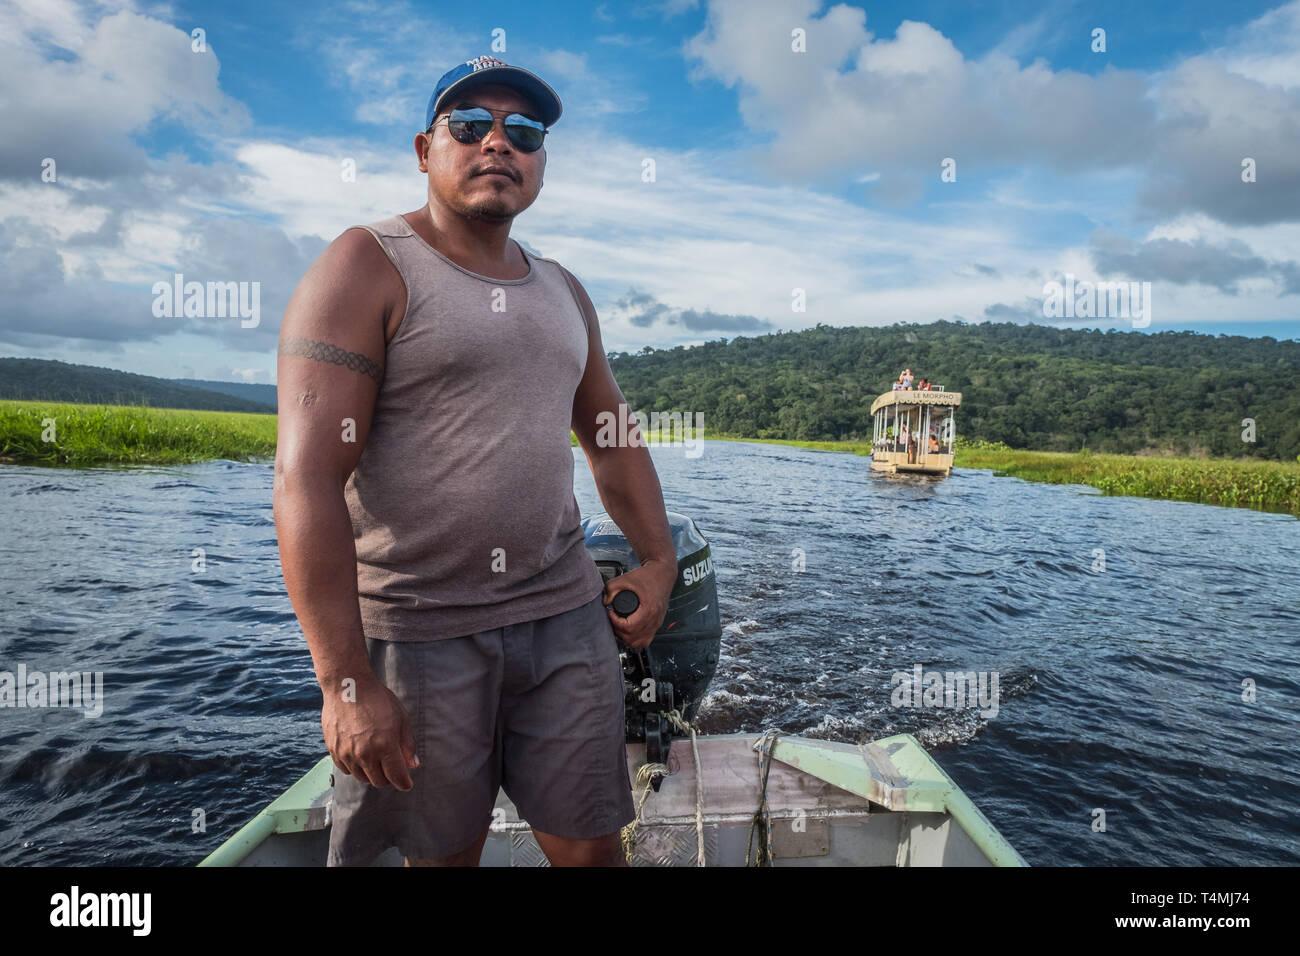 Man in a canoe, Guyana, Kaw, France - Stock Image